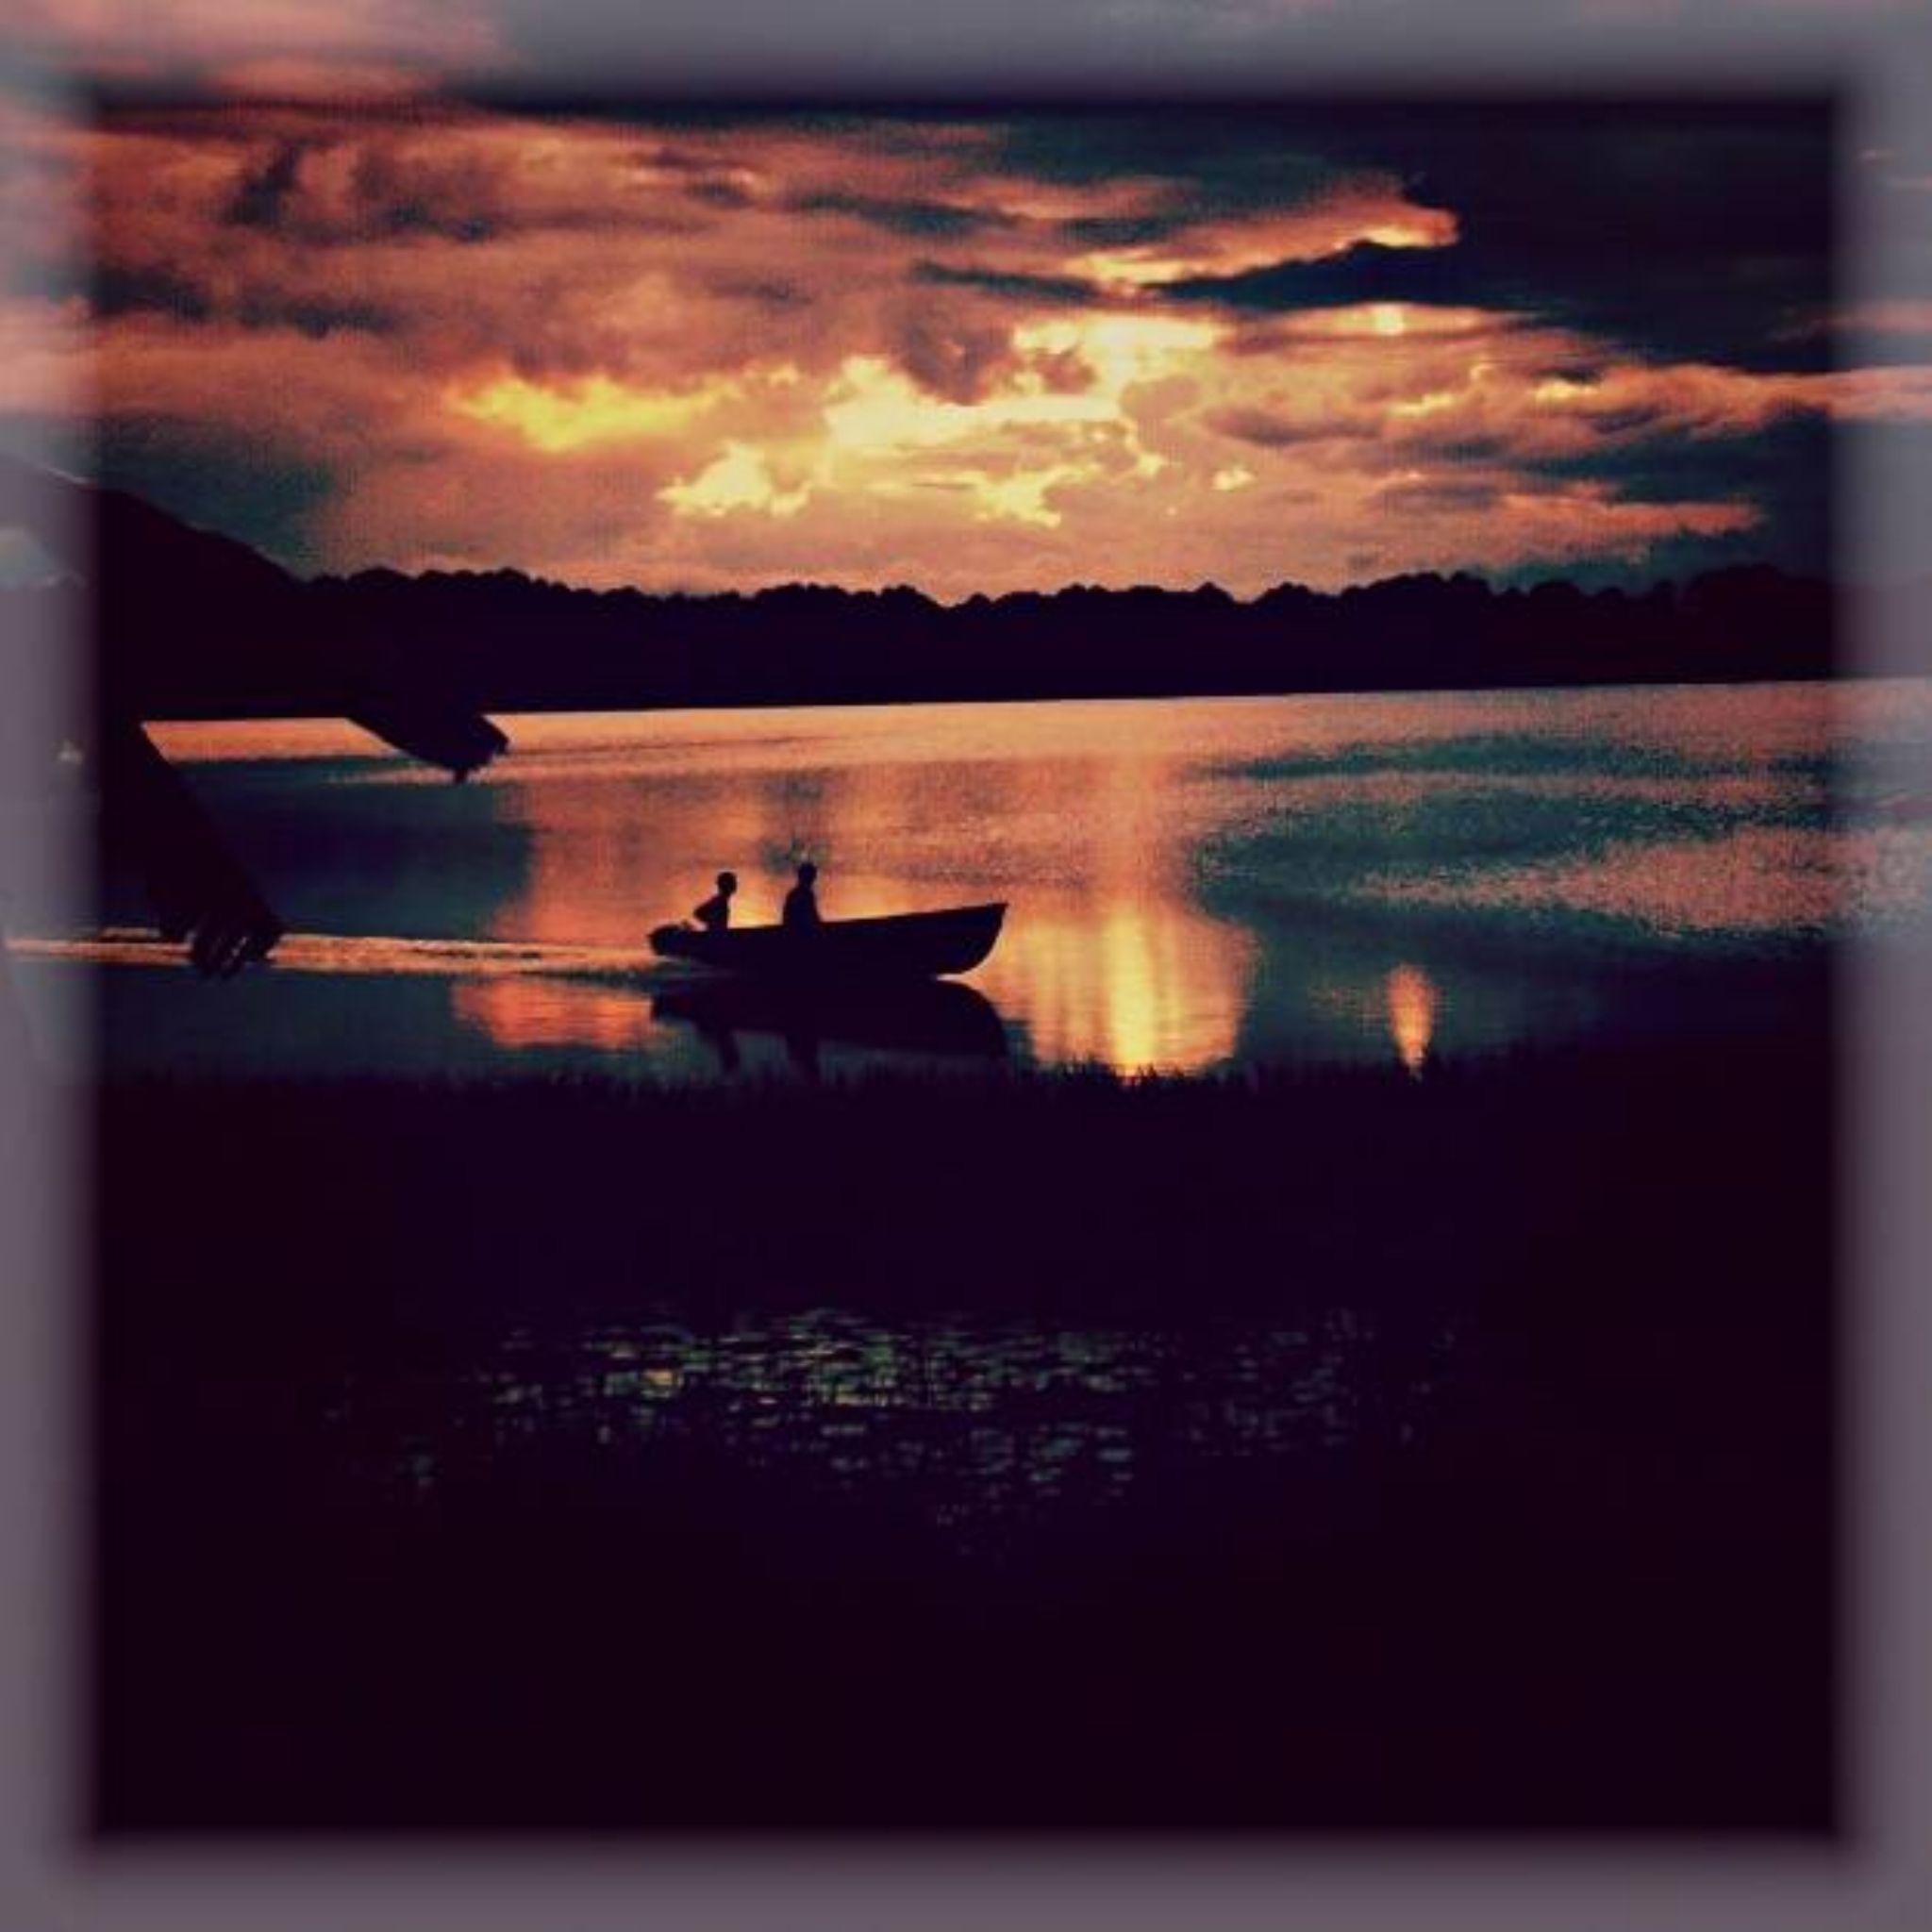 boating at night by Chelsey Elizabeth